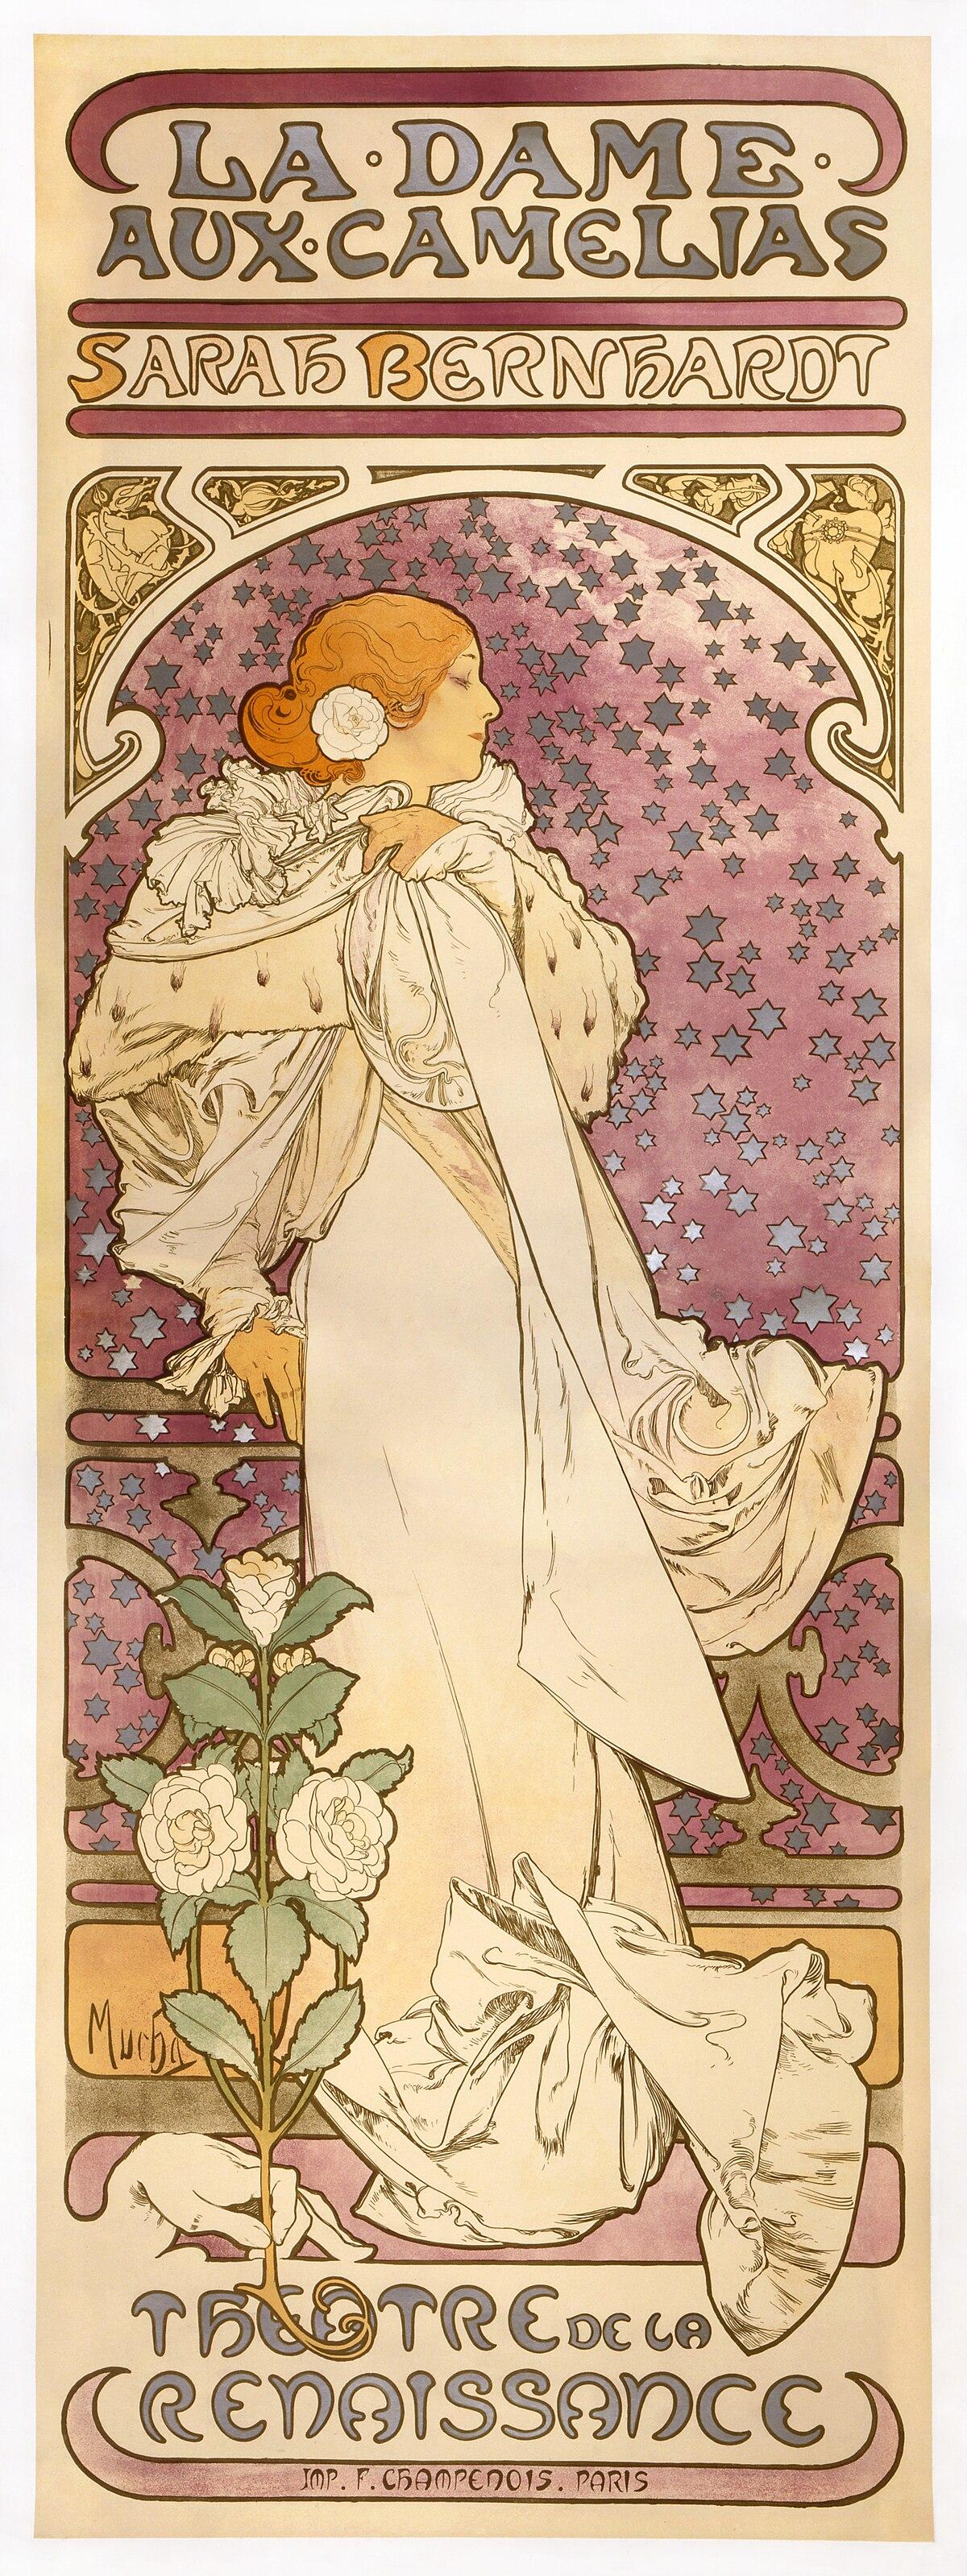 Alphonse Mucha, La Dame aux Camélias with Sarah Bernhardt, 1896, Library of Congress, Washington, DC, USA.